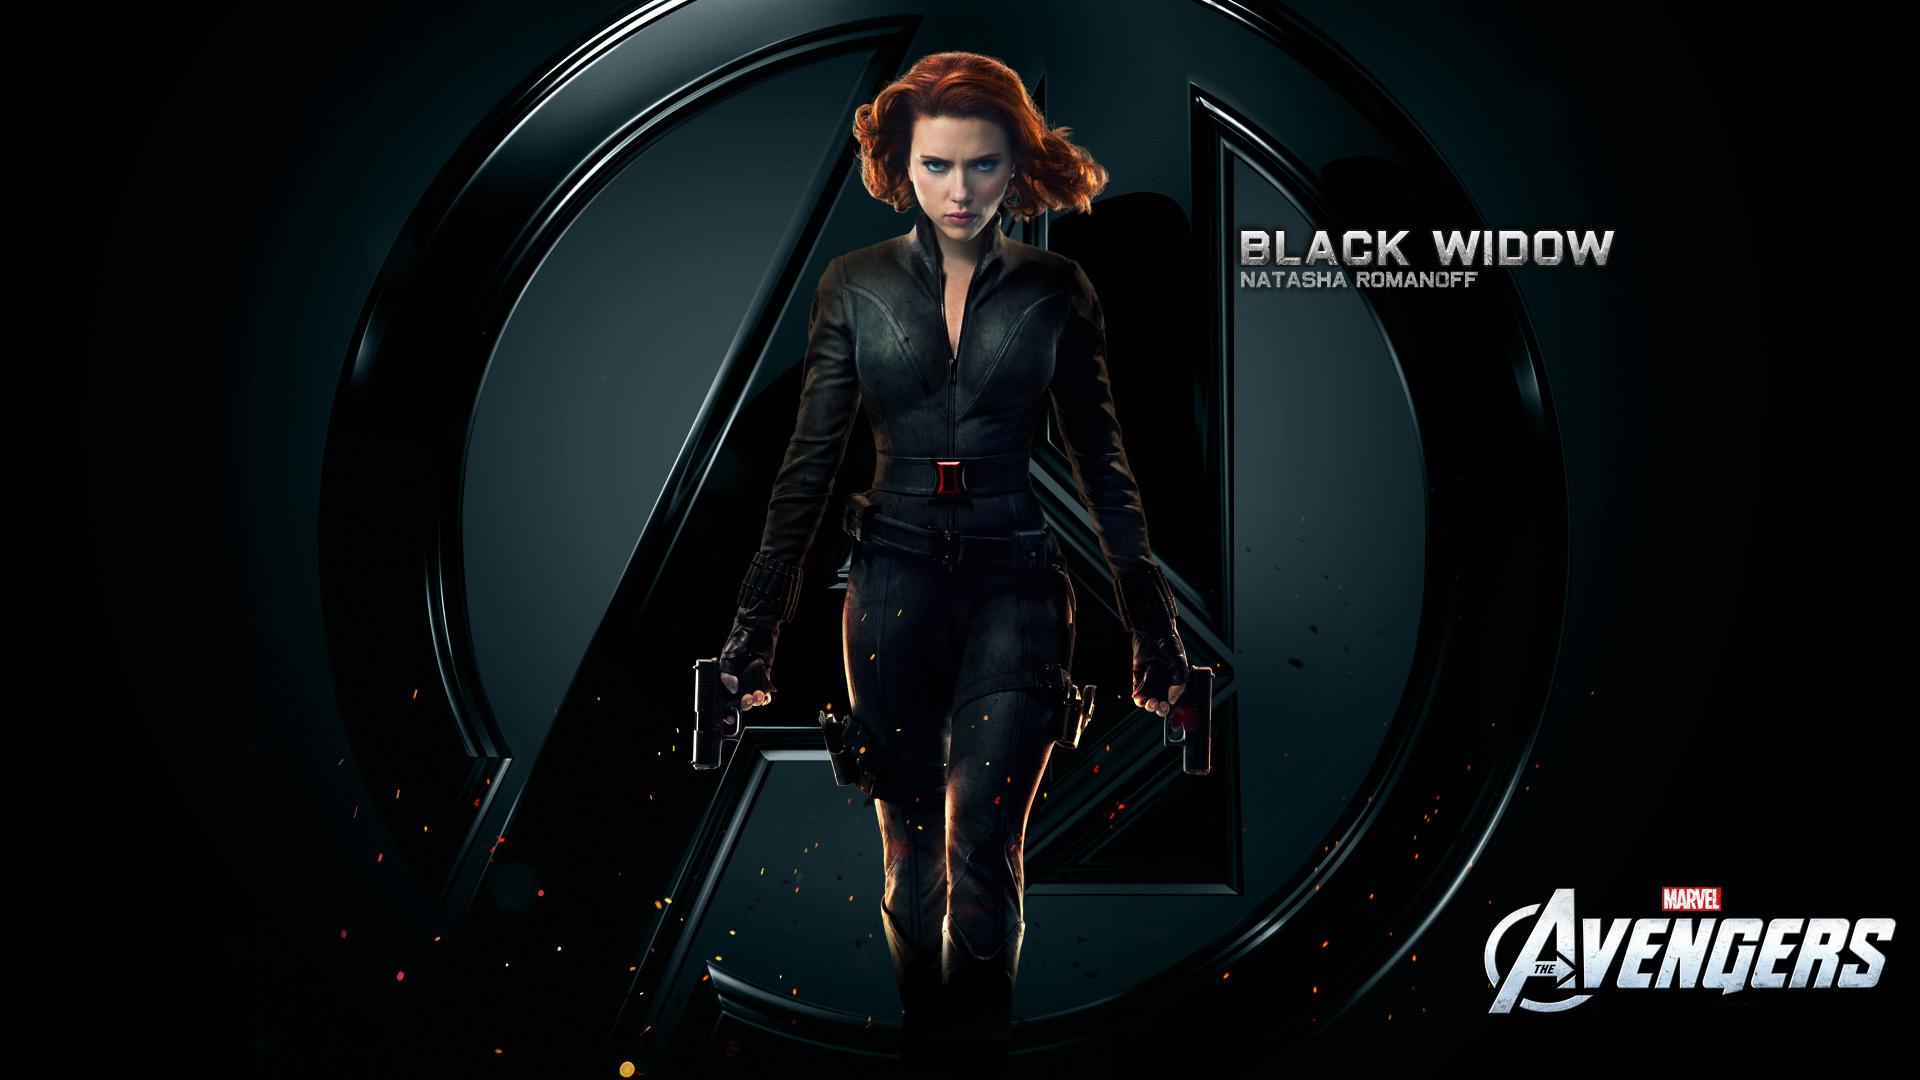 Black Widow Natasha Romanoff Wallpapers HD Wallpapers 1920x1080